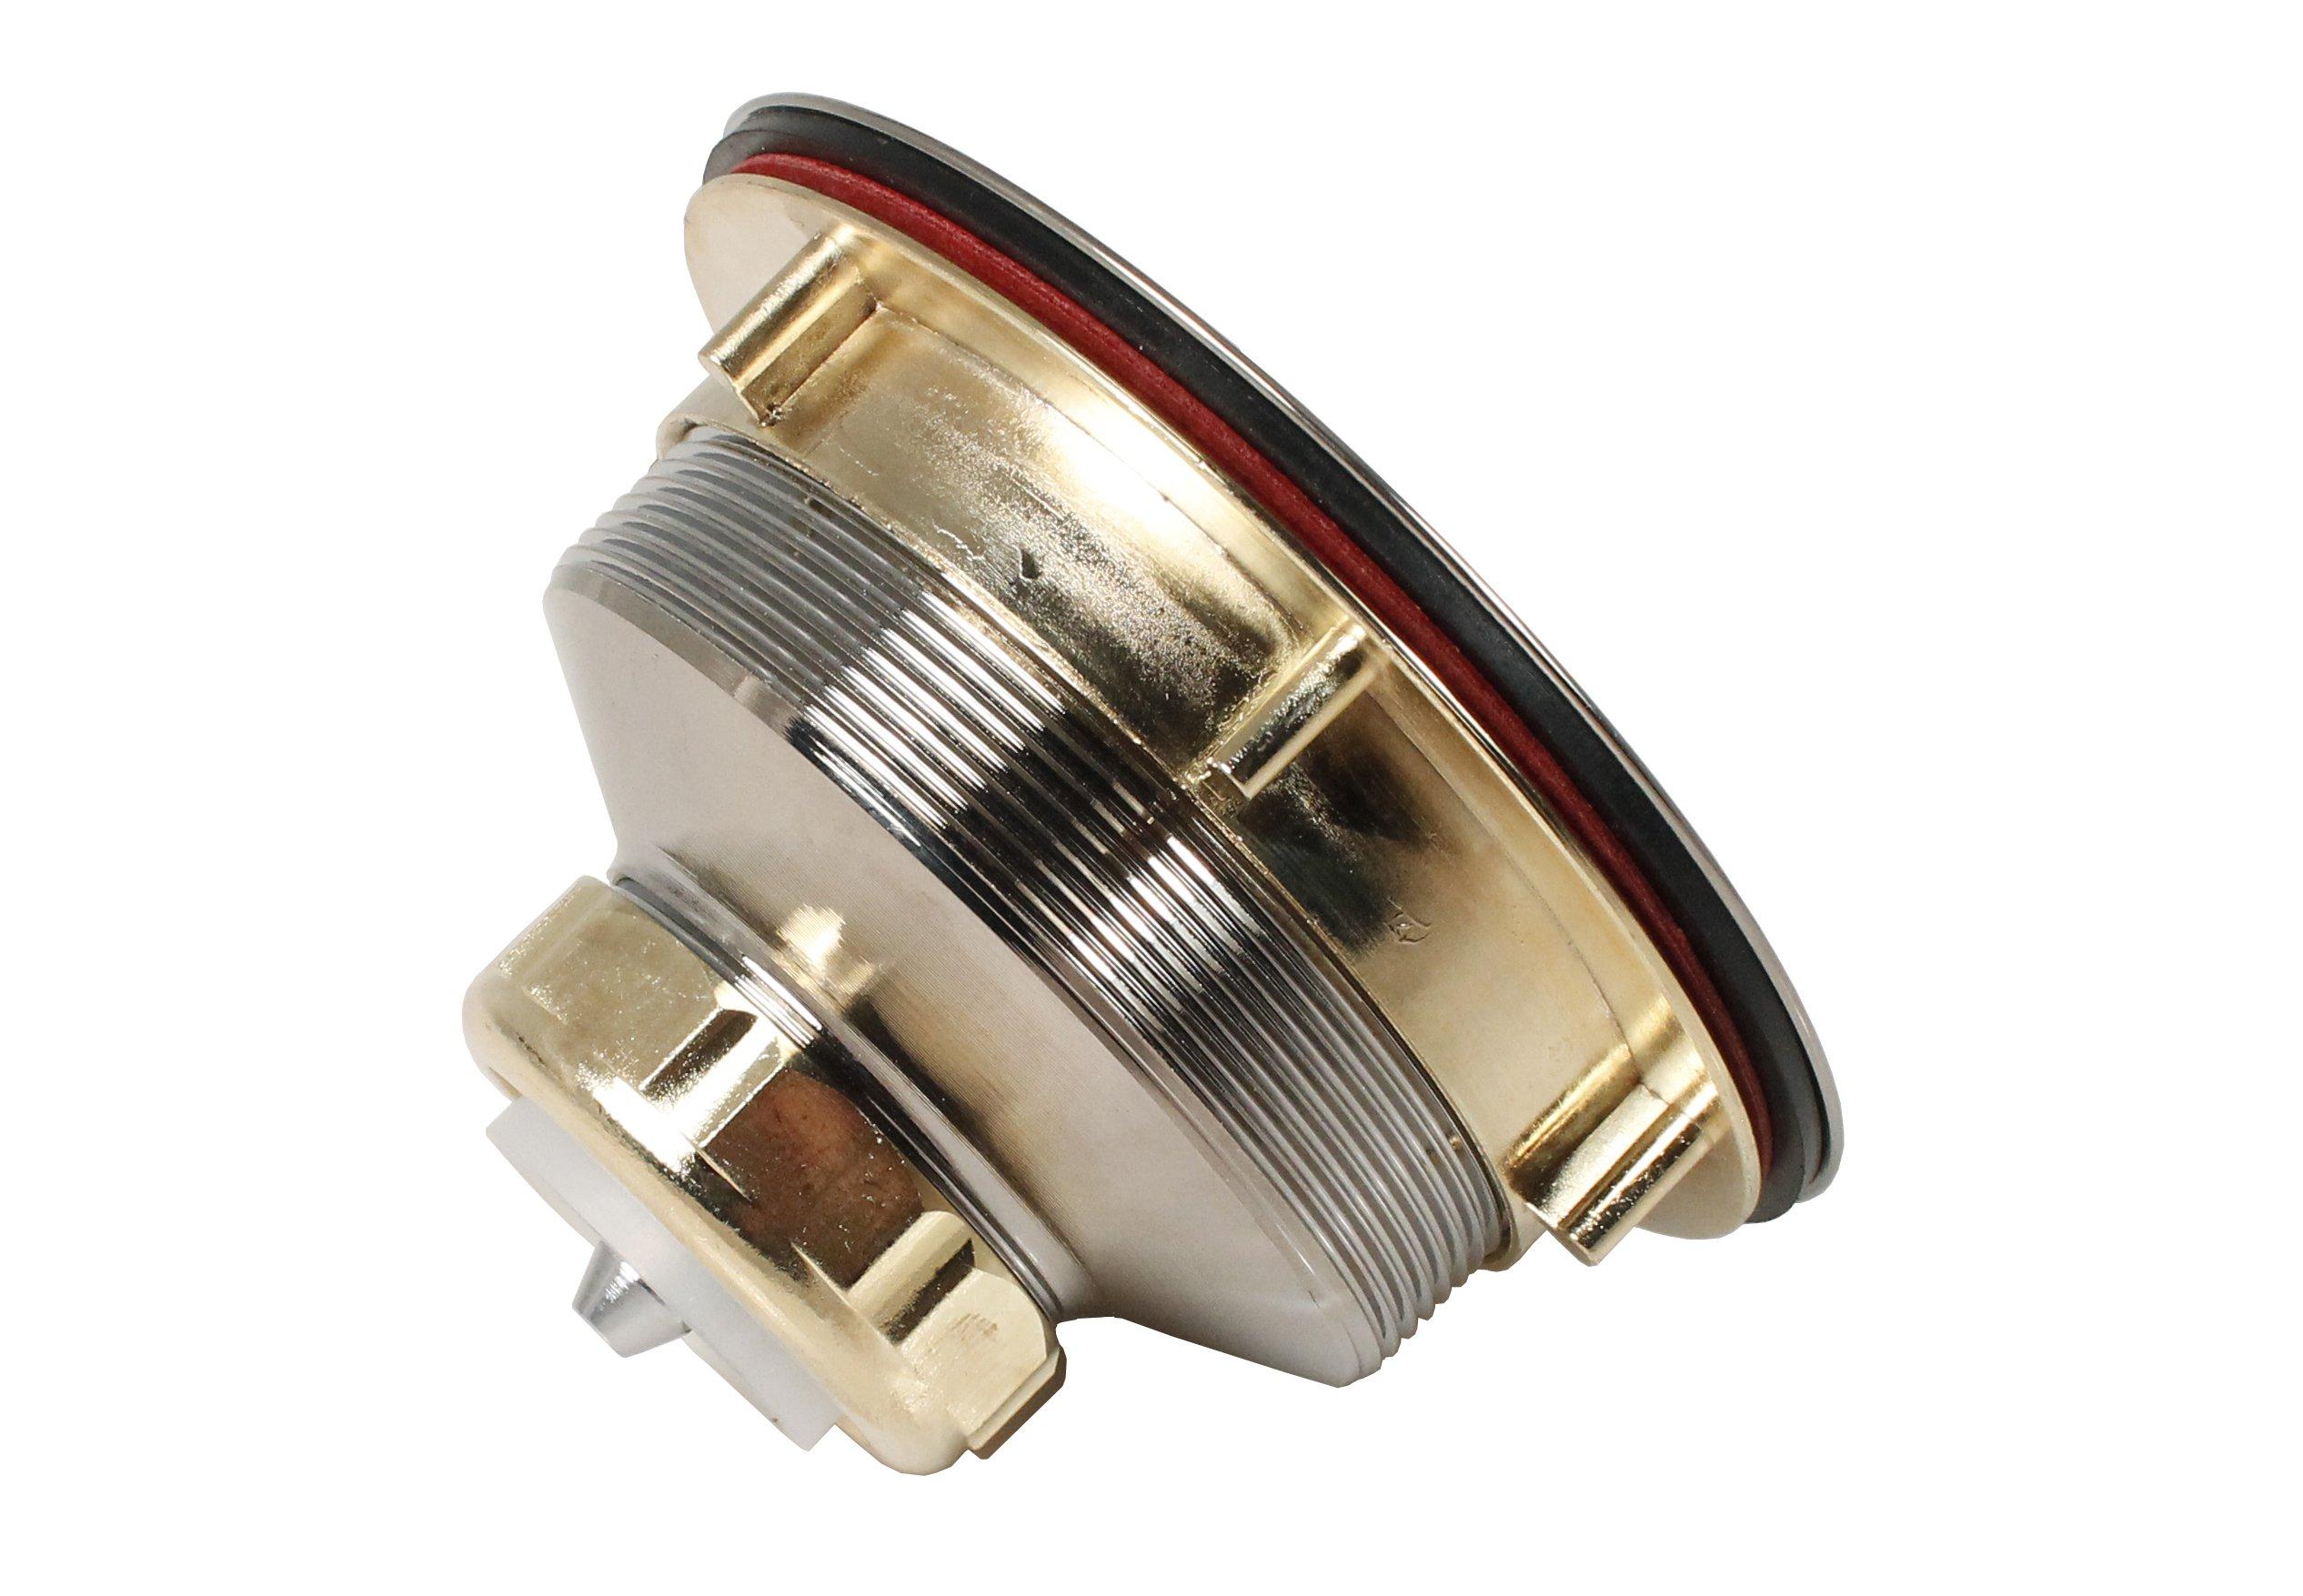 Keeney K1439SS Deep Thread Cast Brass Sink Power Ball Basket, Complete Kitchen Strainer 4.5'', Stainless Steel by Keeney (Image #8)